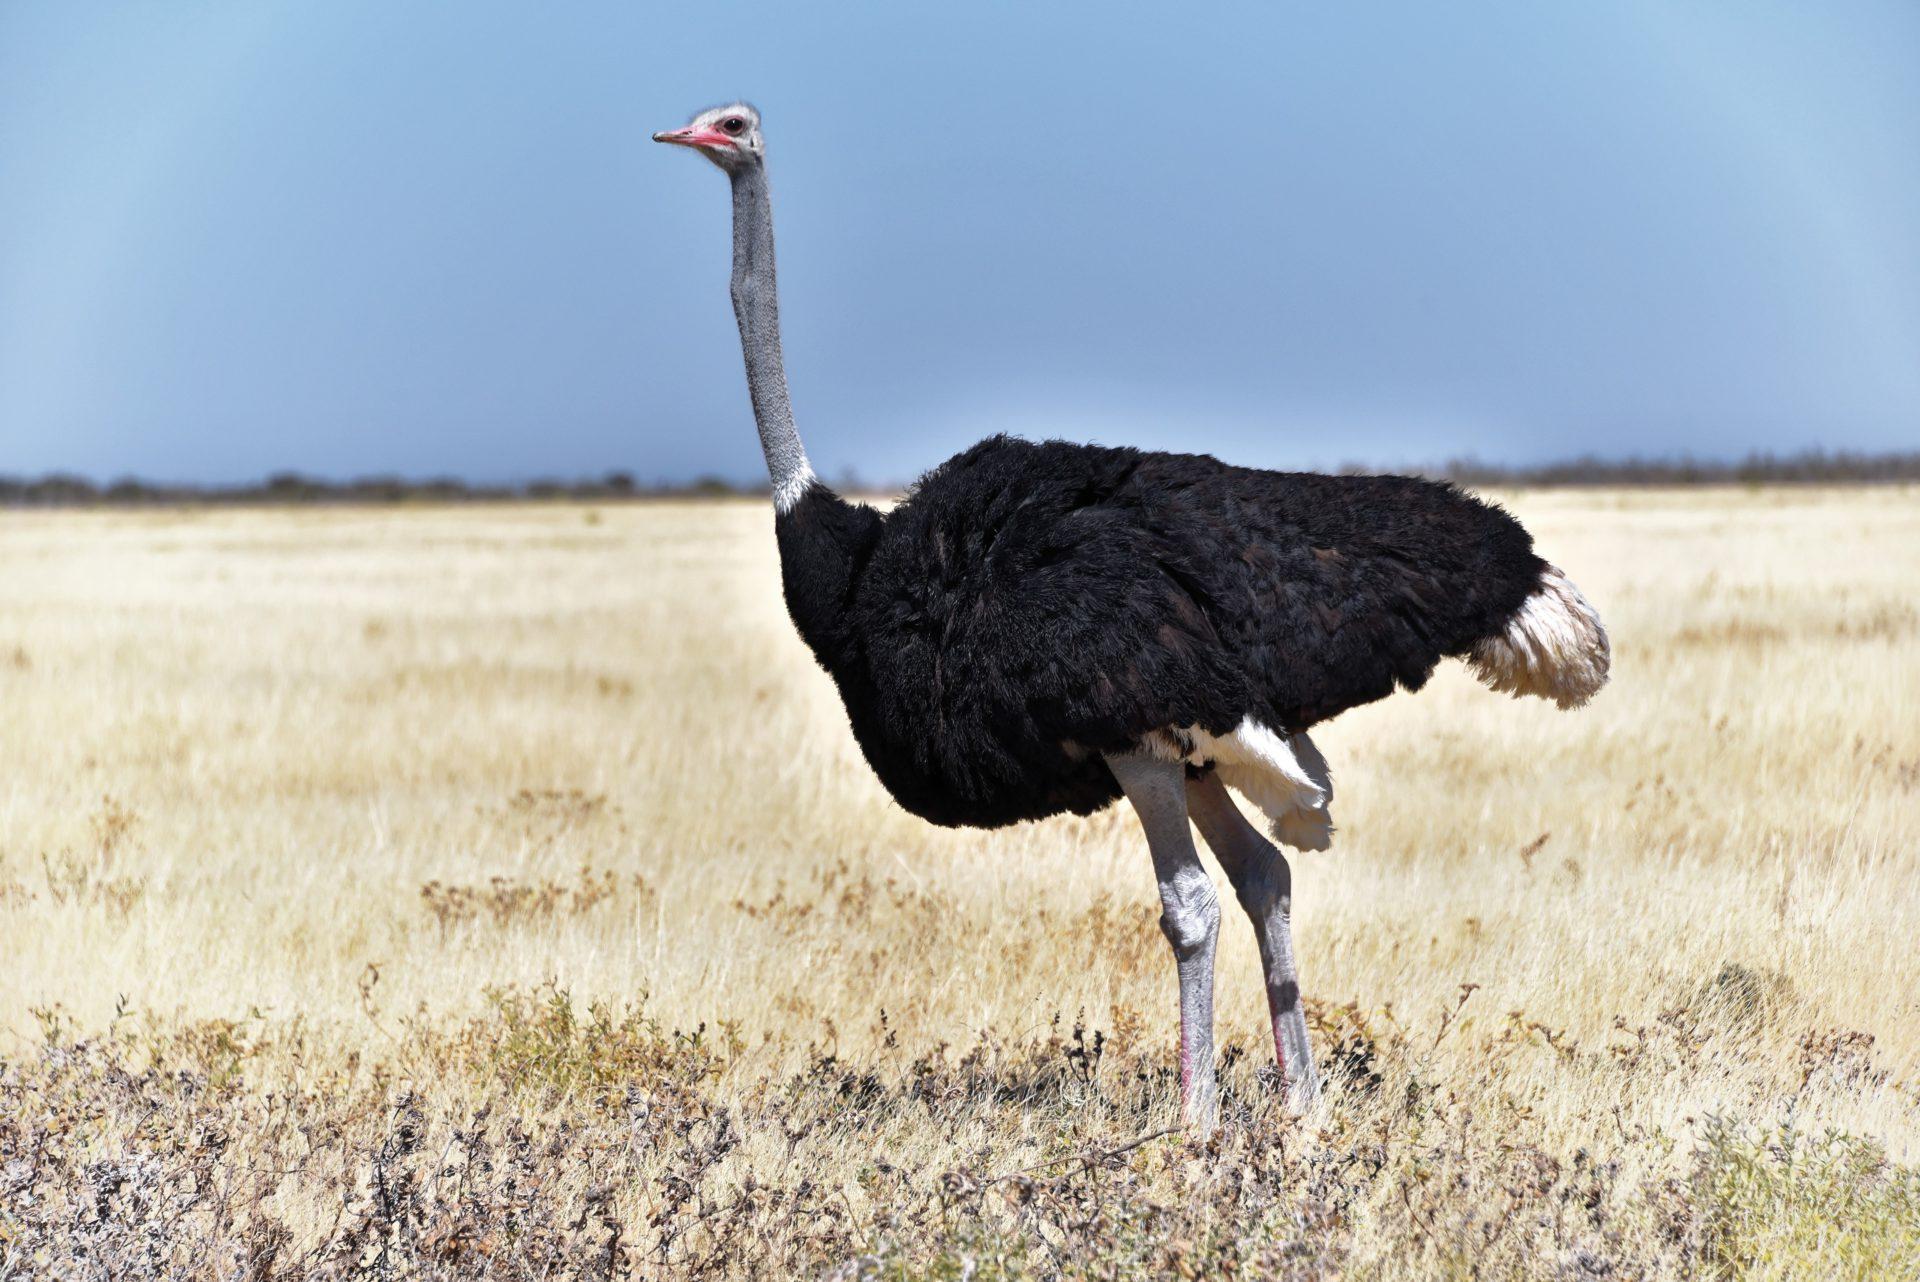 Strauß - Etosha National Park - Namibia